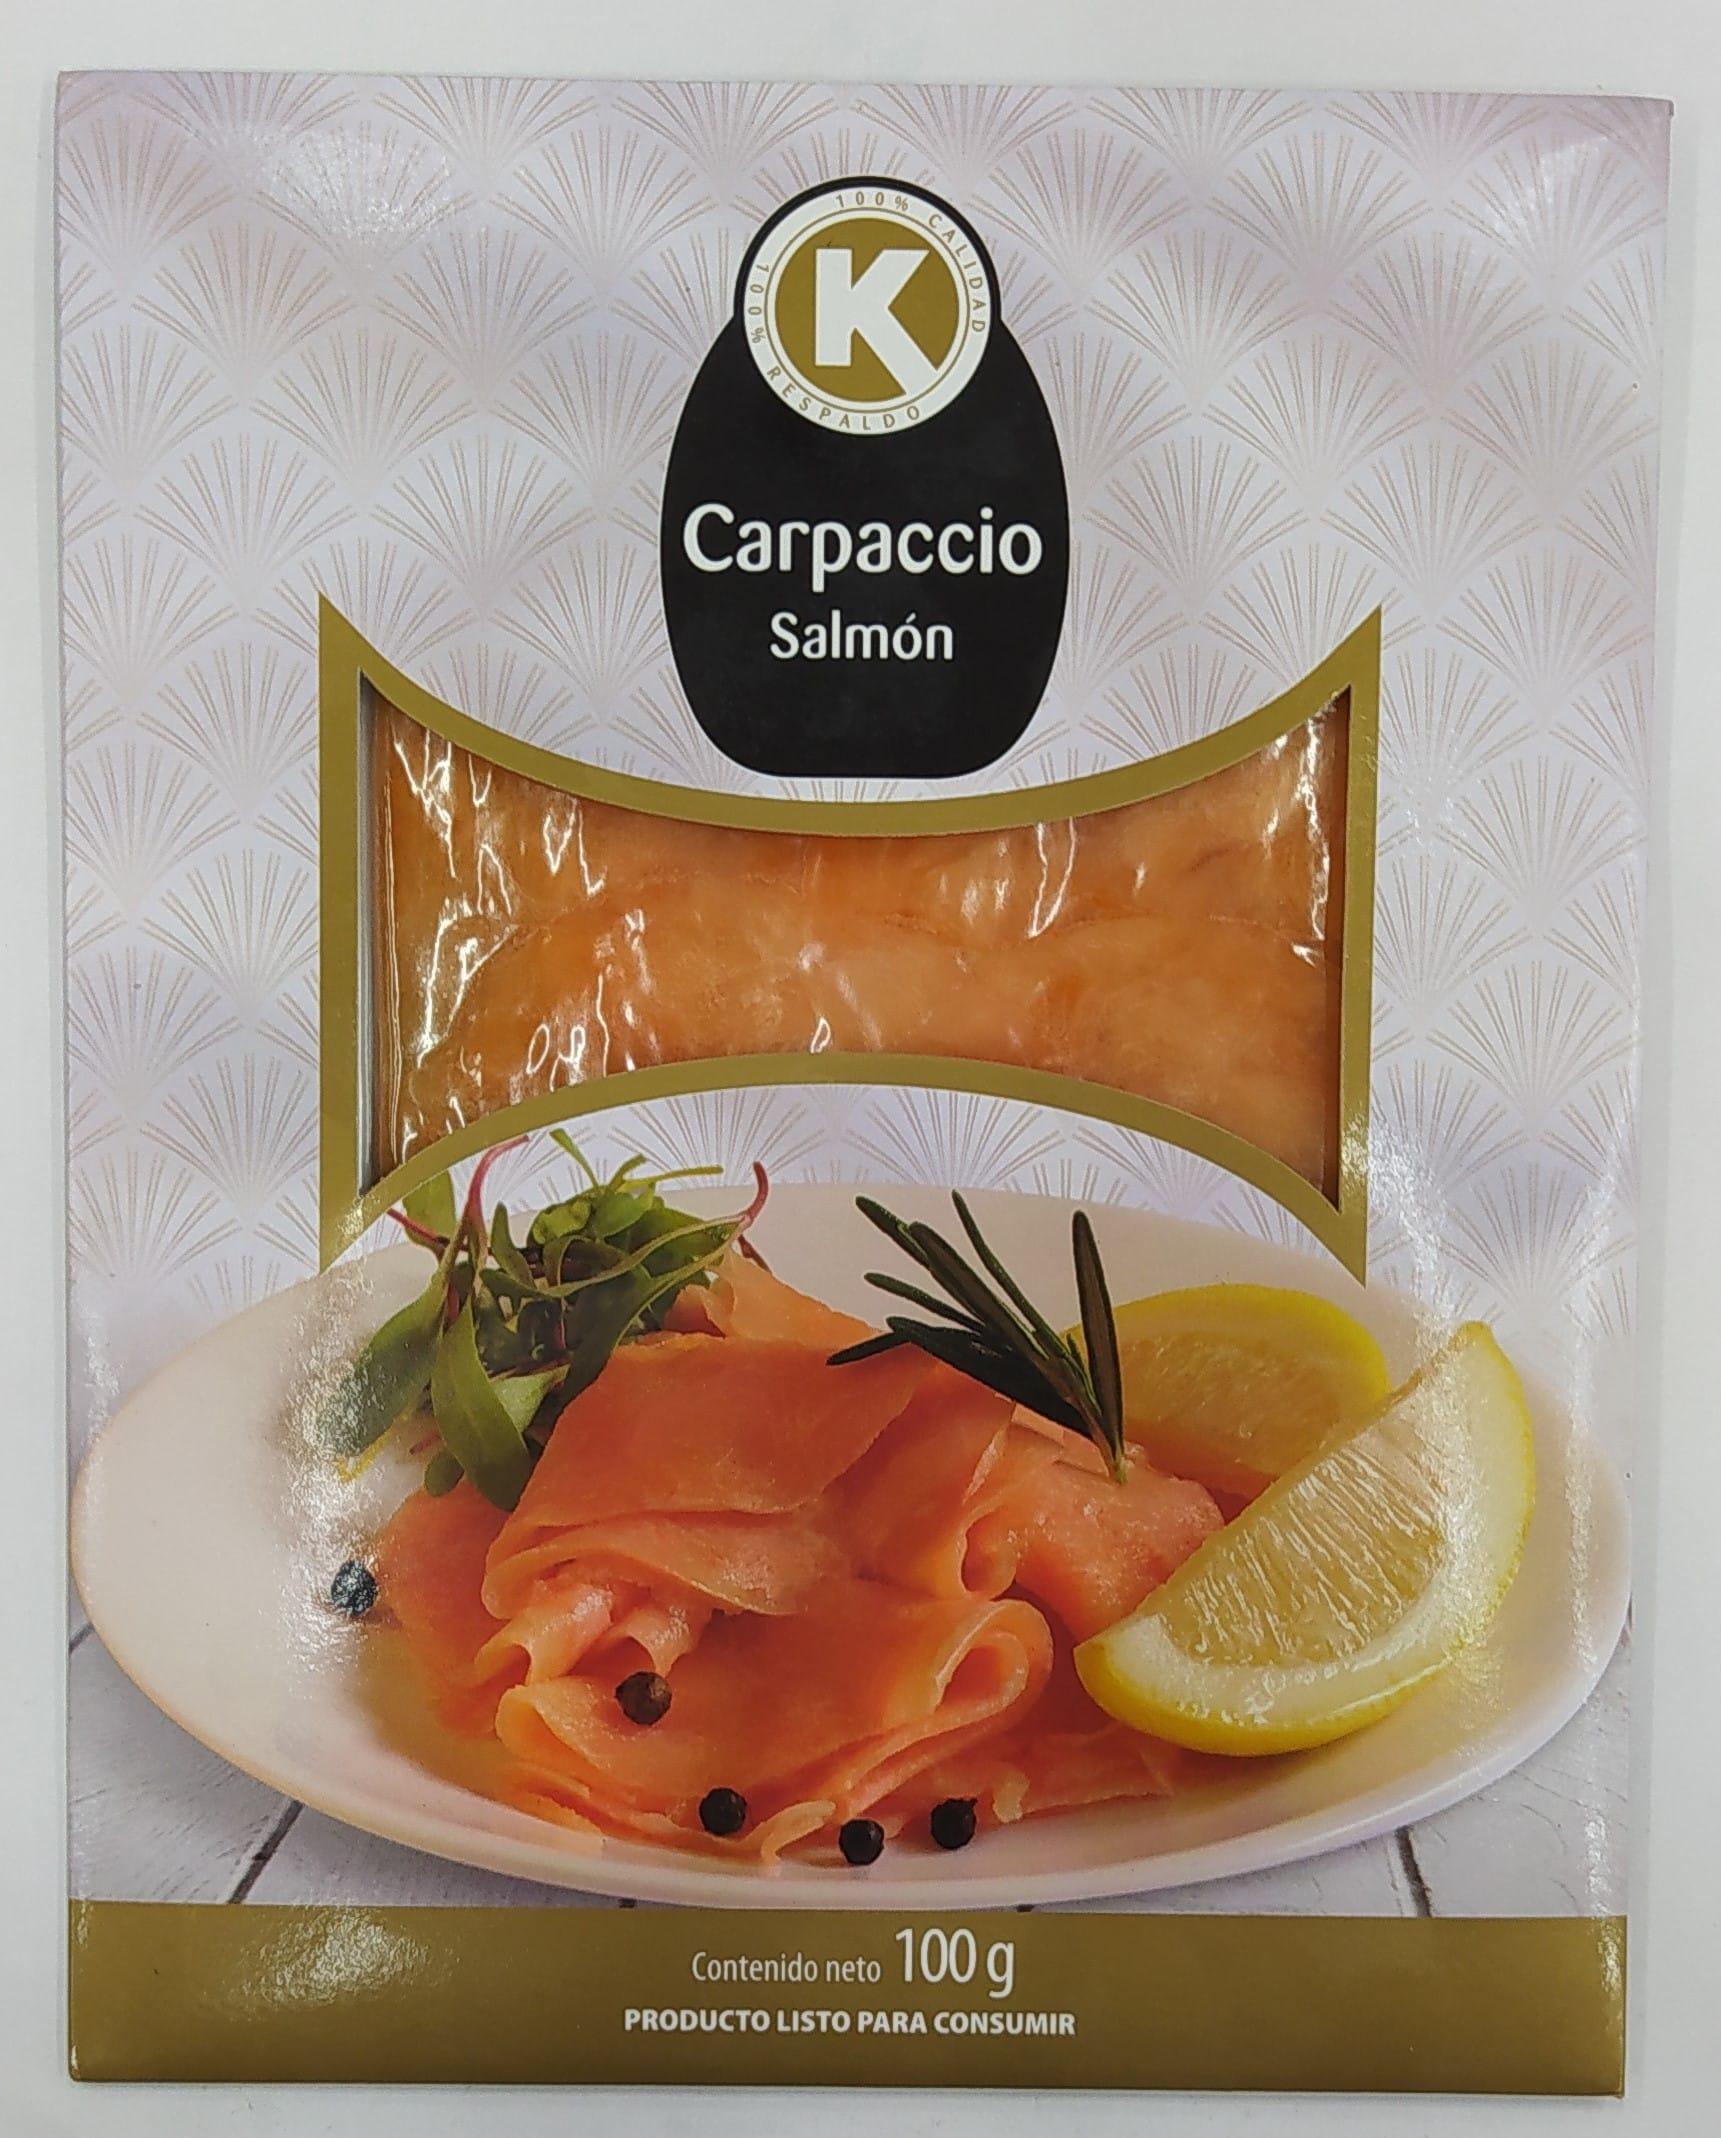 Carpaccio k de Salmon 100g